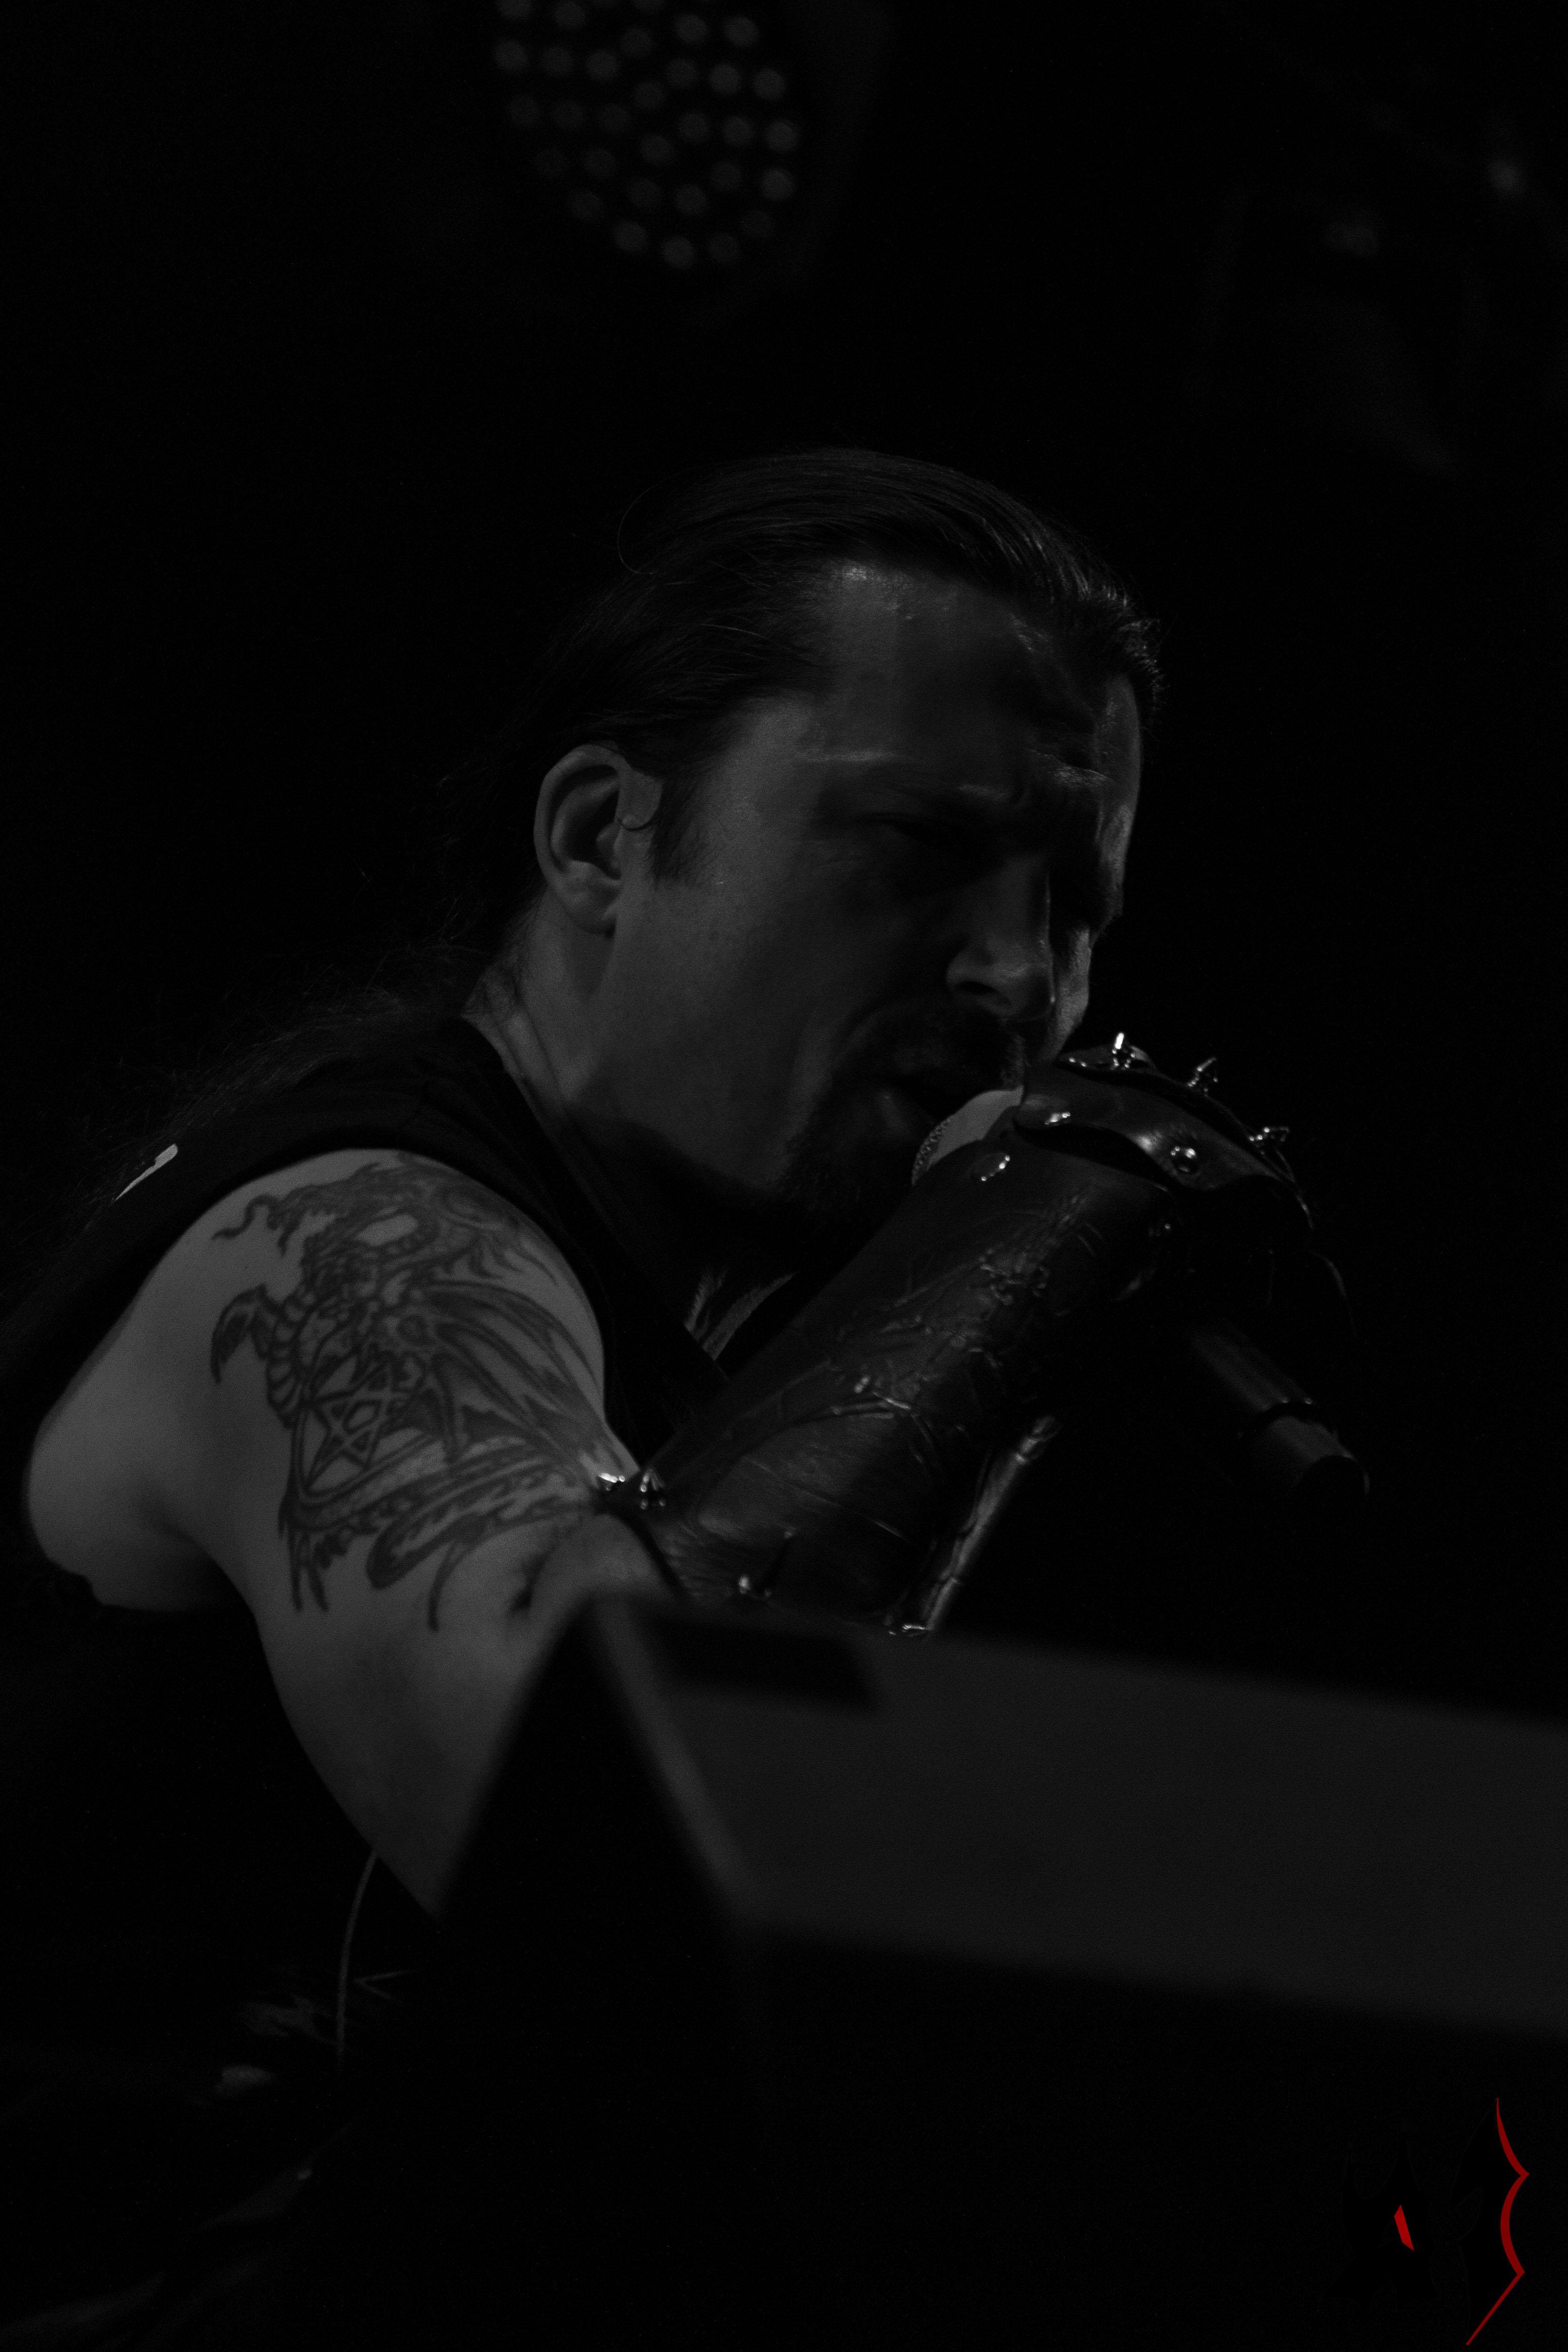 Hellfest - Possessed - 4